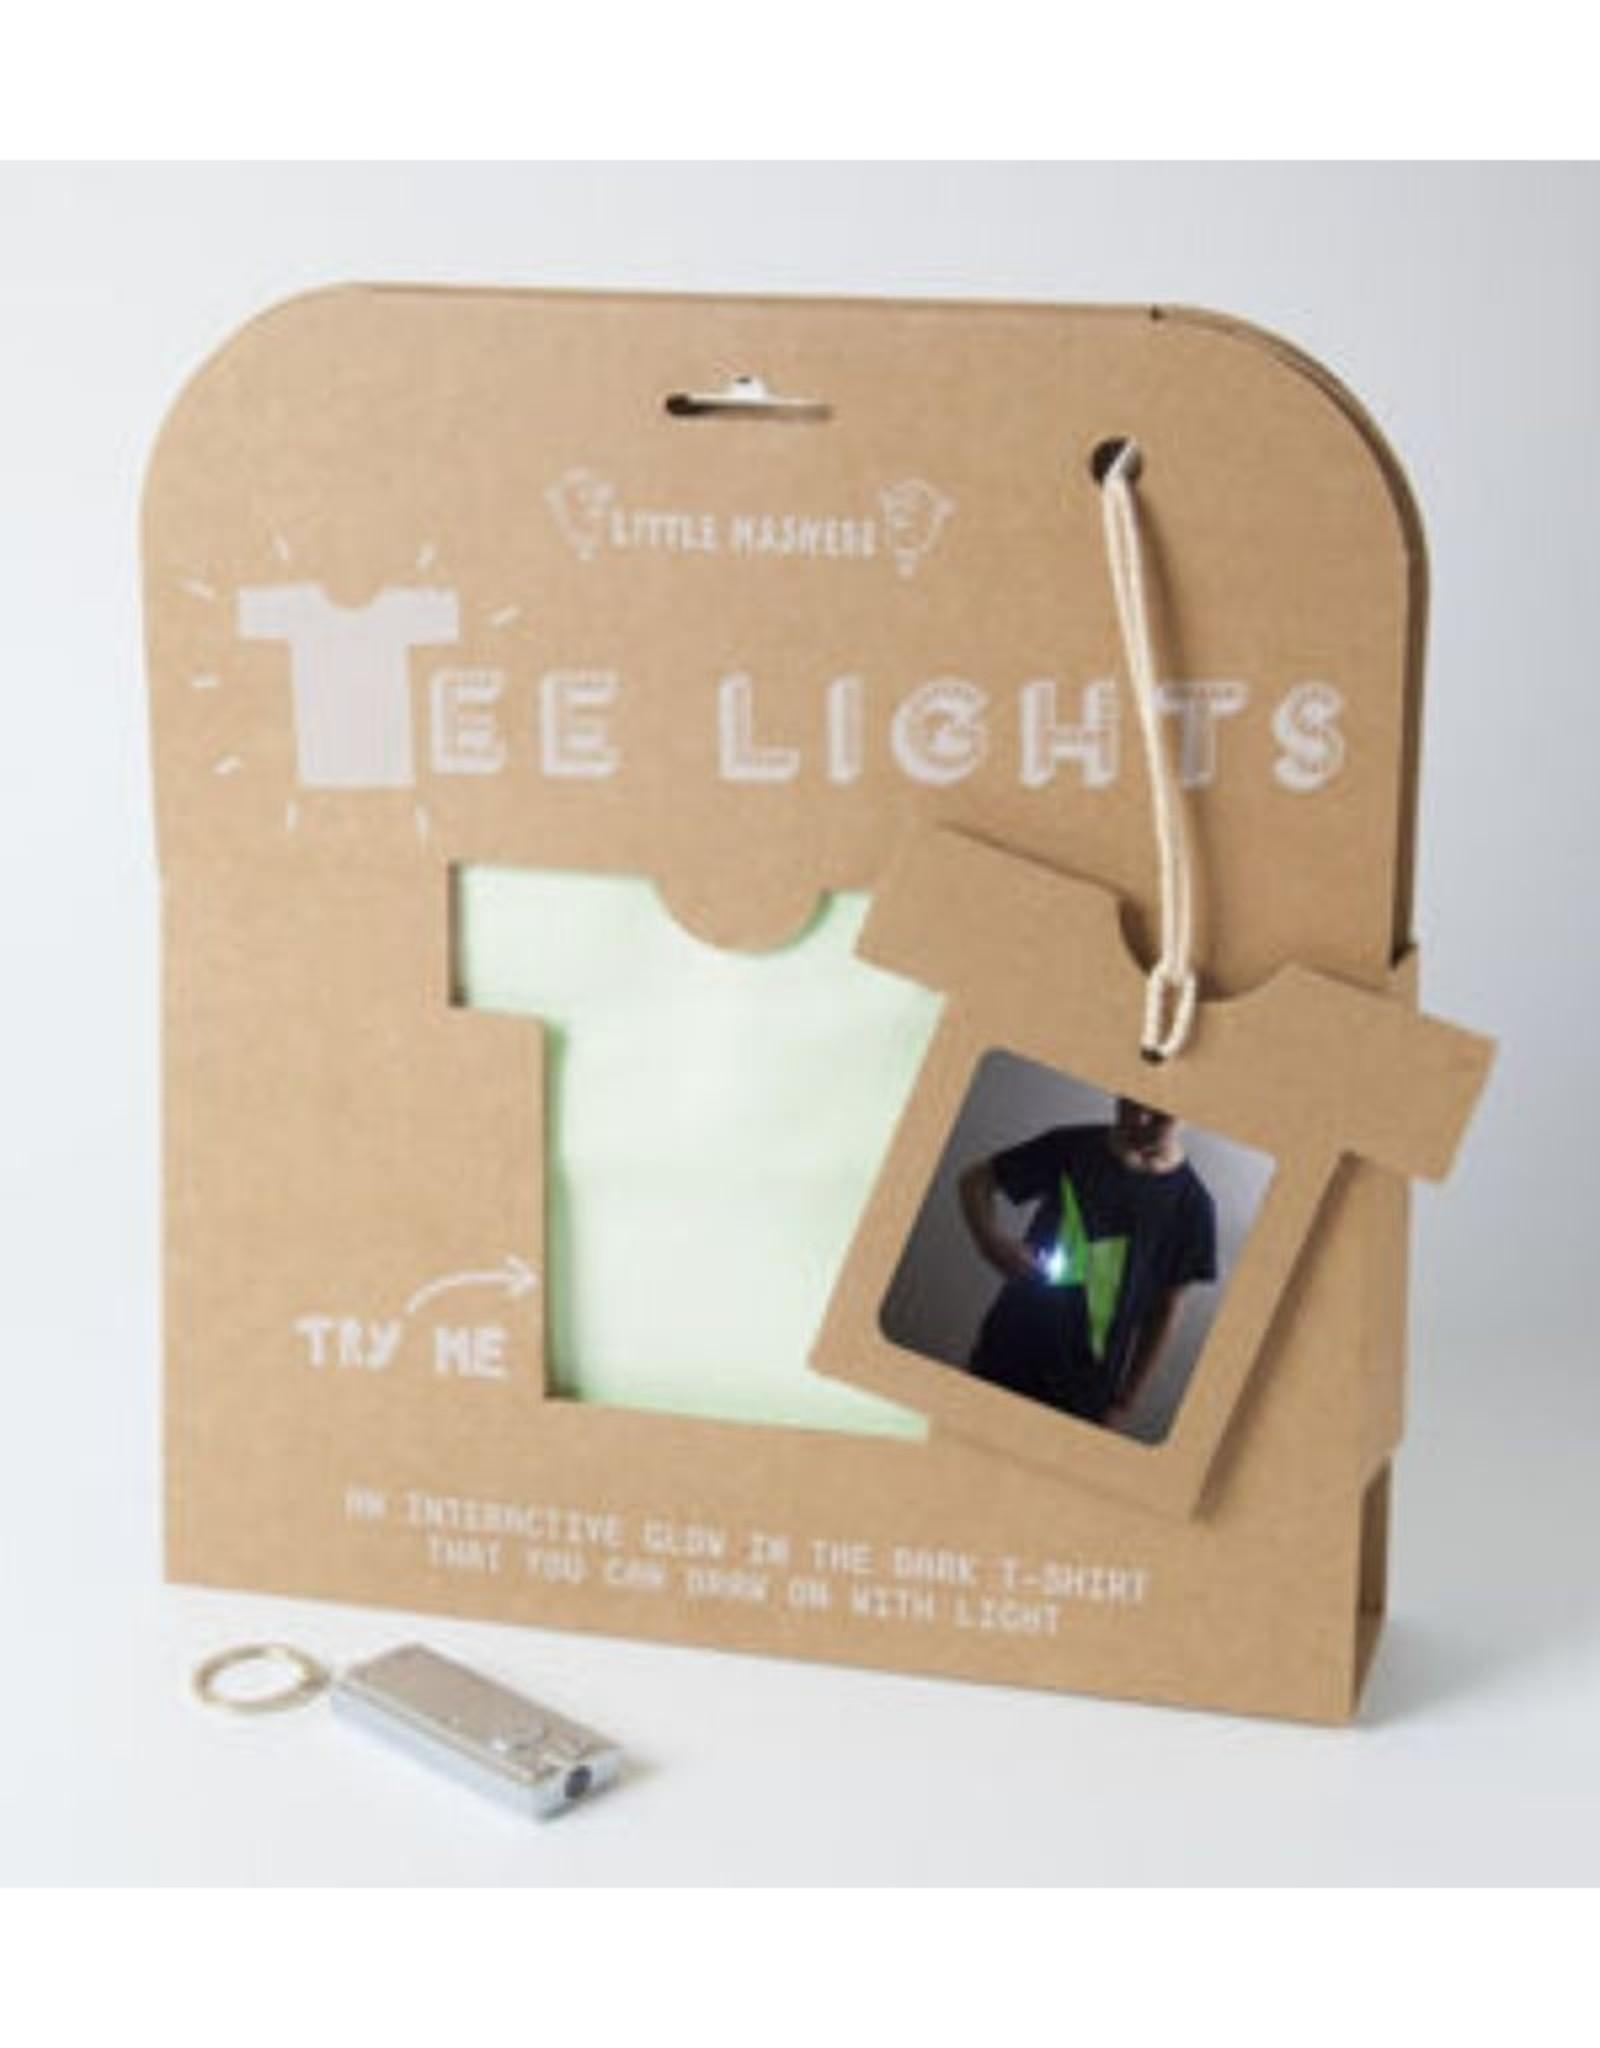 Little Mashers Tee Light Glow Up Lightning